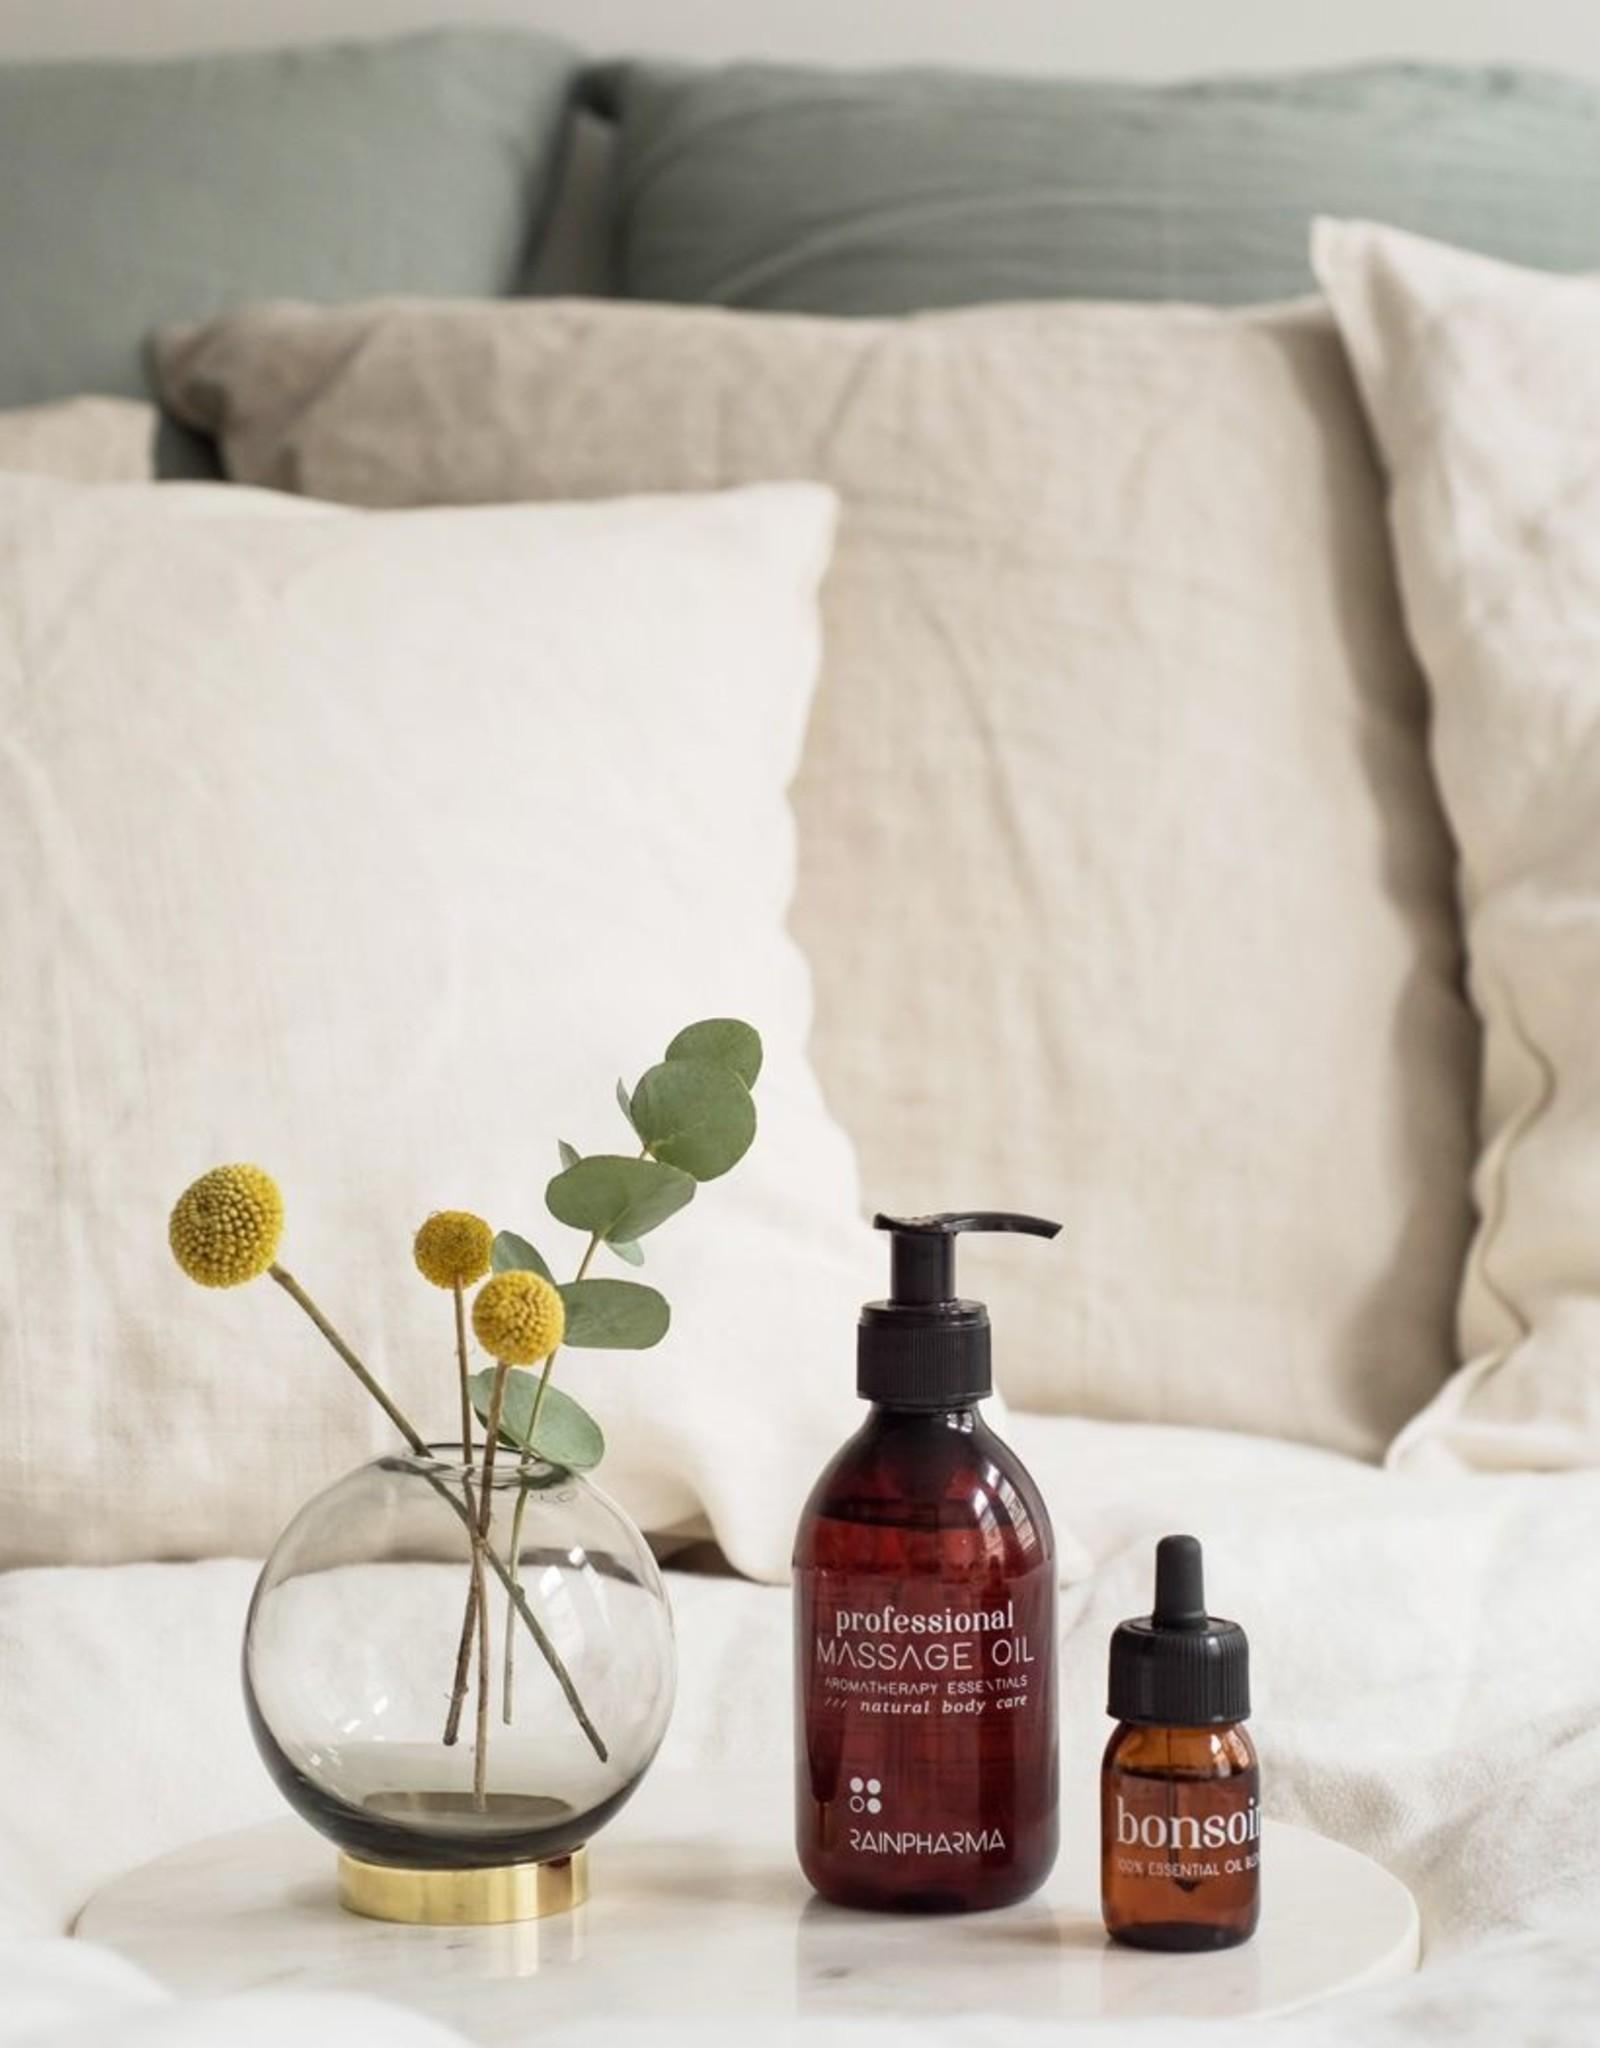 RainPharma Rainpharma - Professional Massage Oil